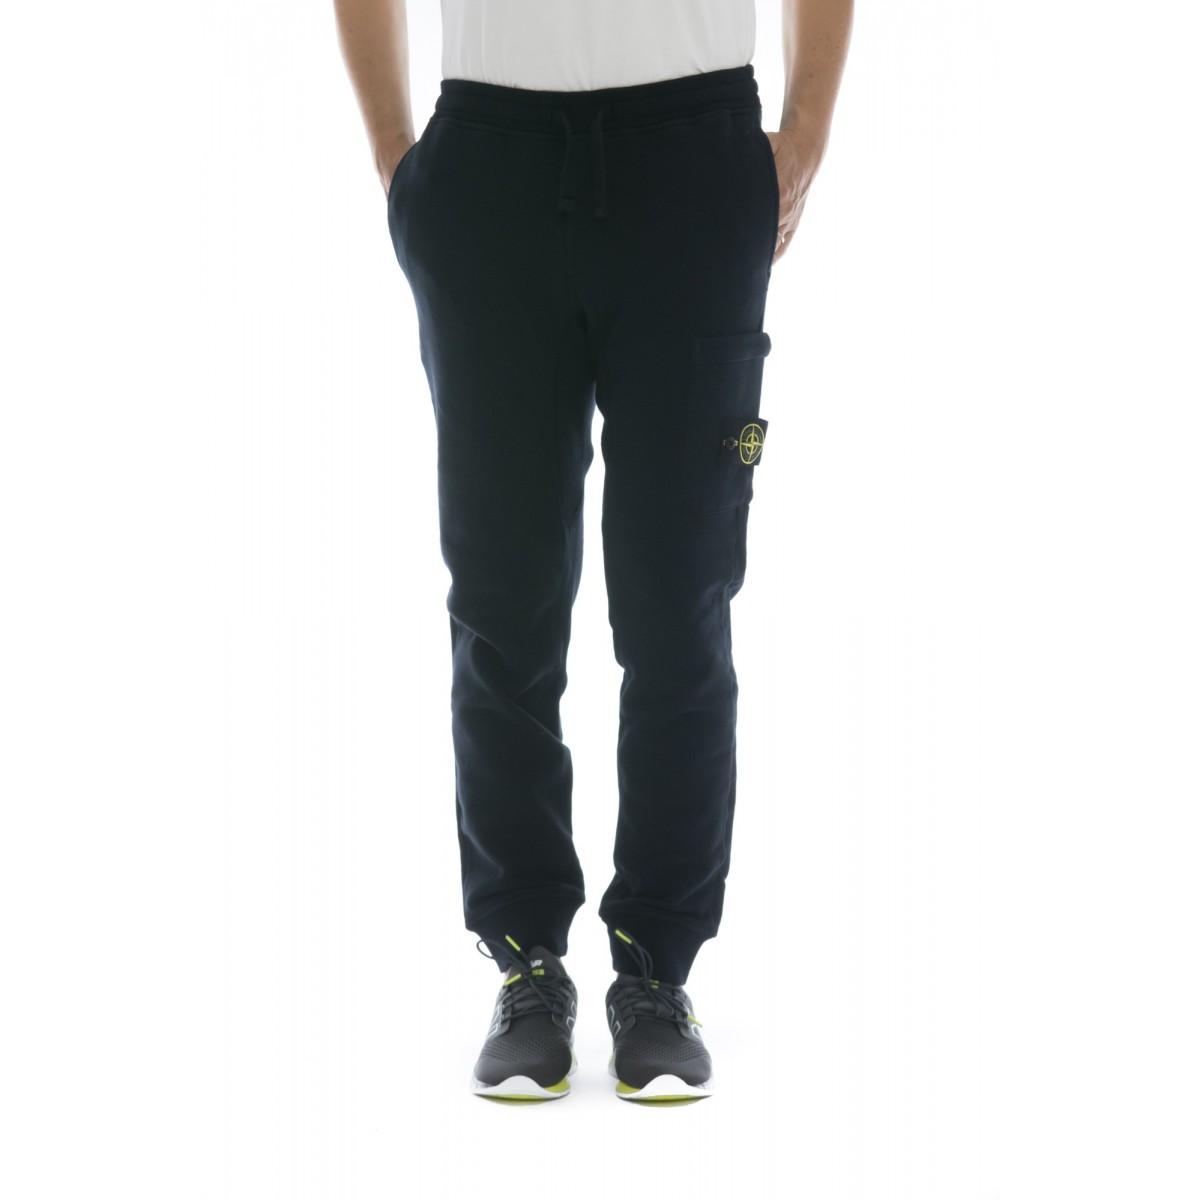 Pantalone uomo - 60320 pantalone felpa jogging